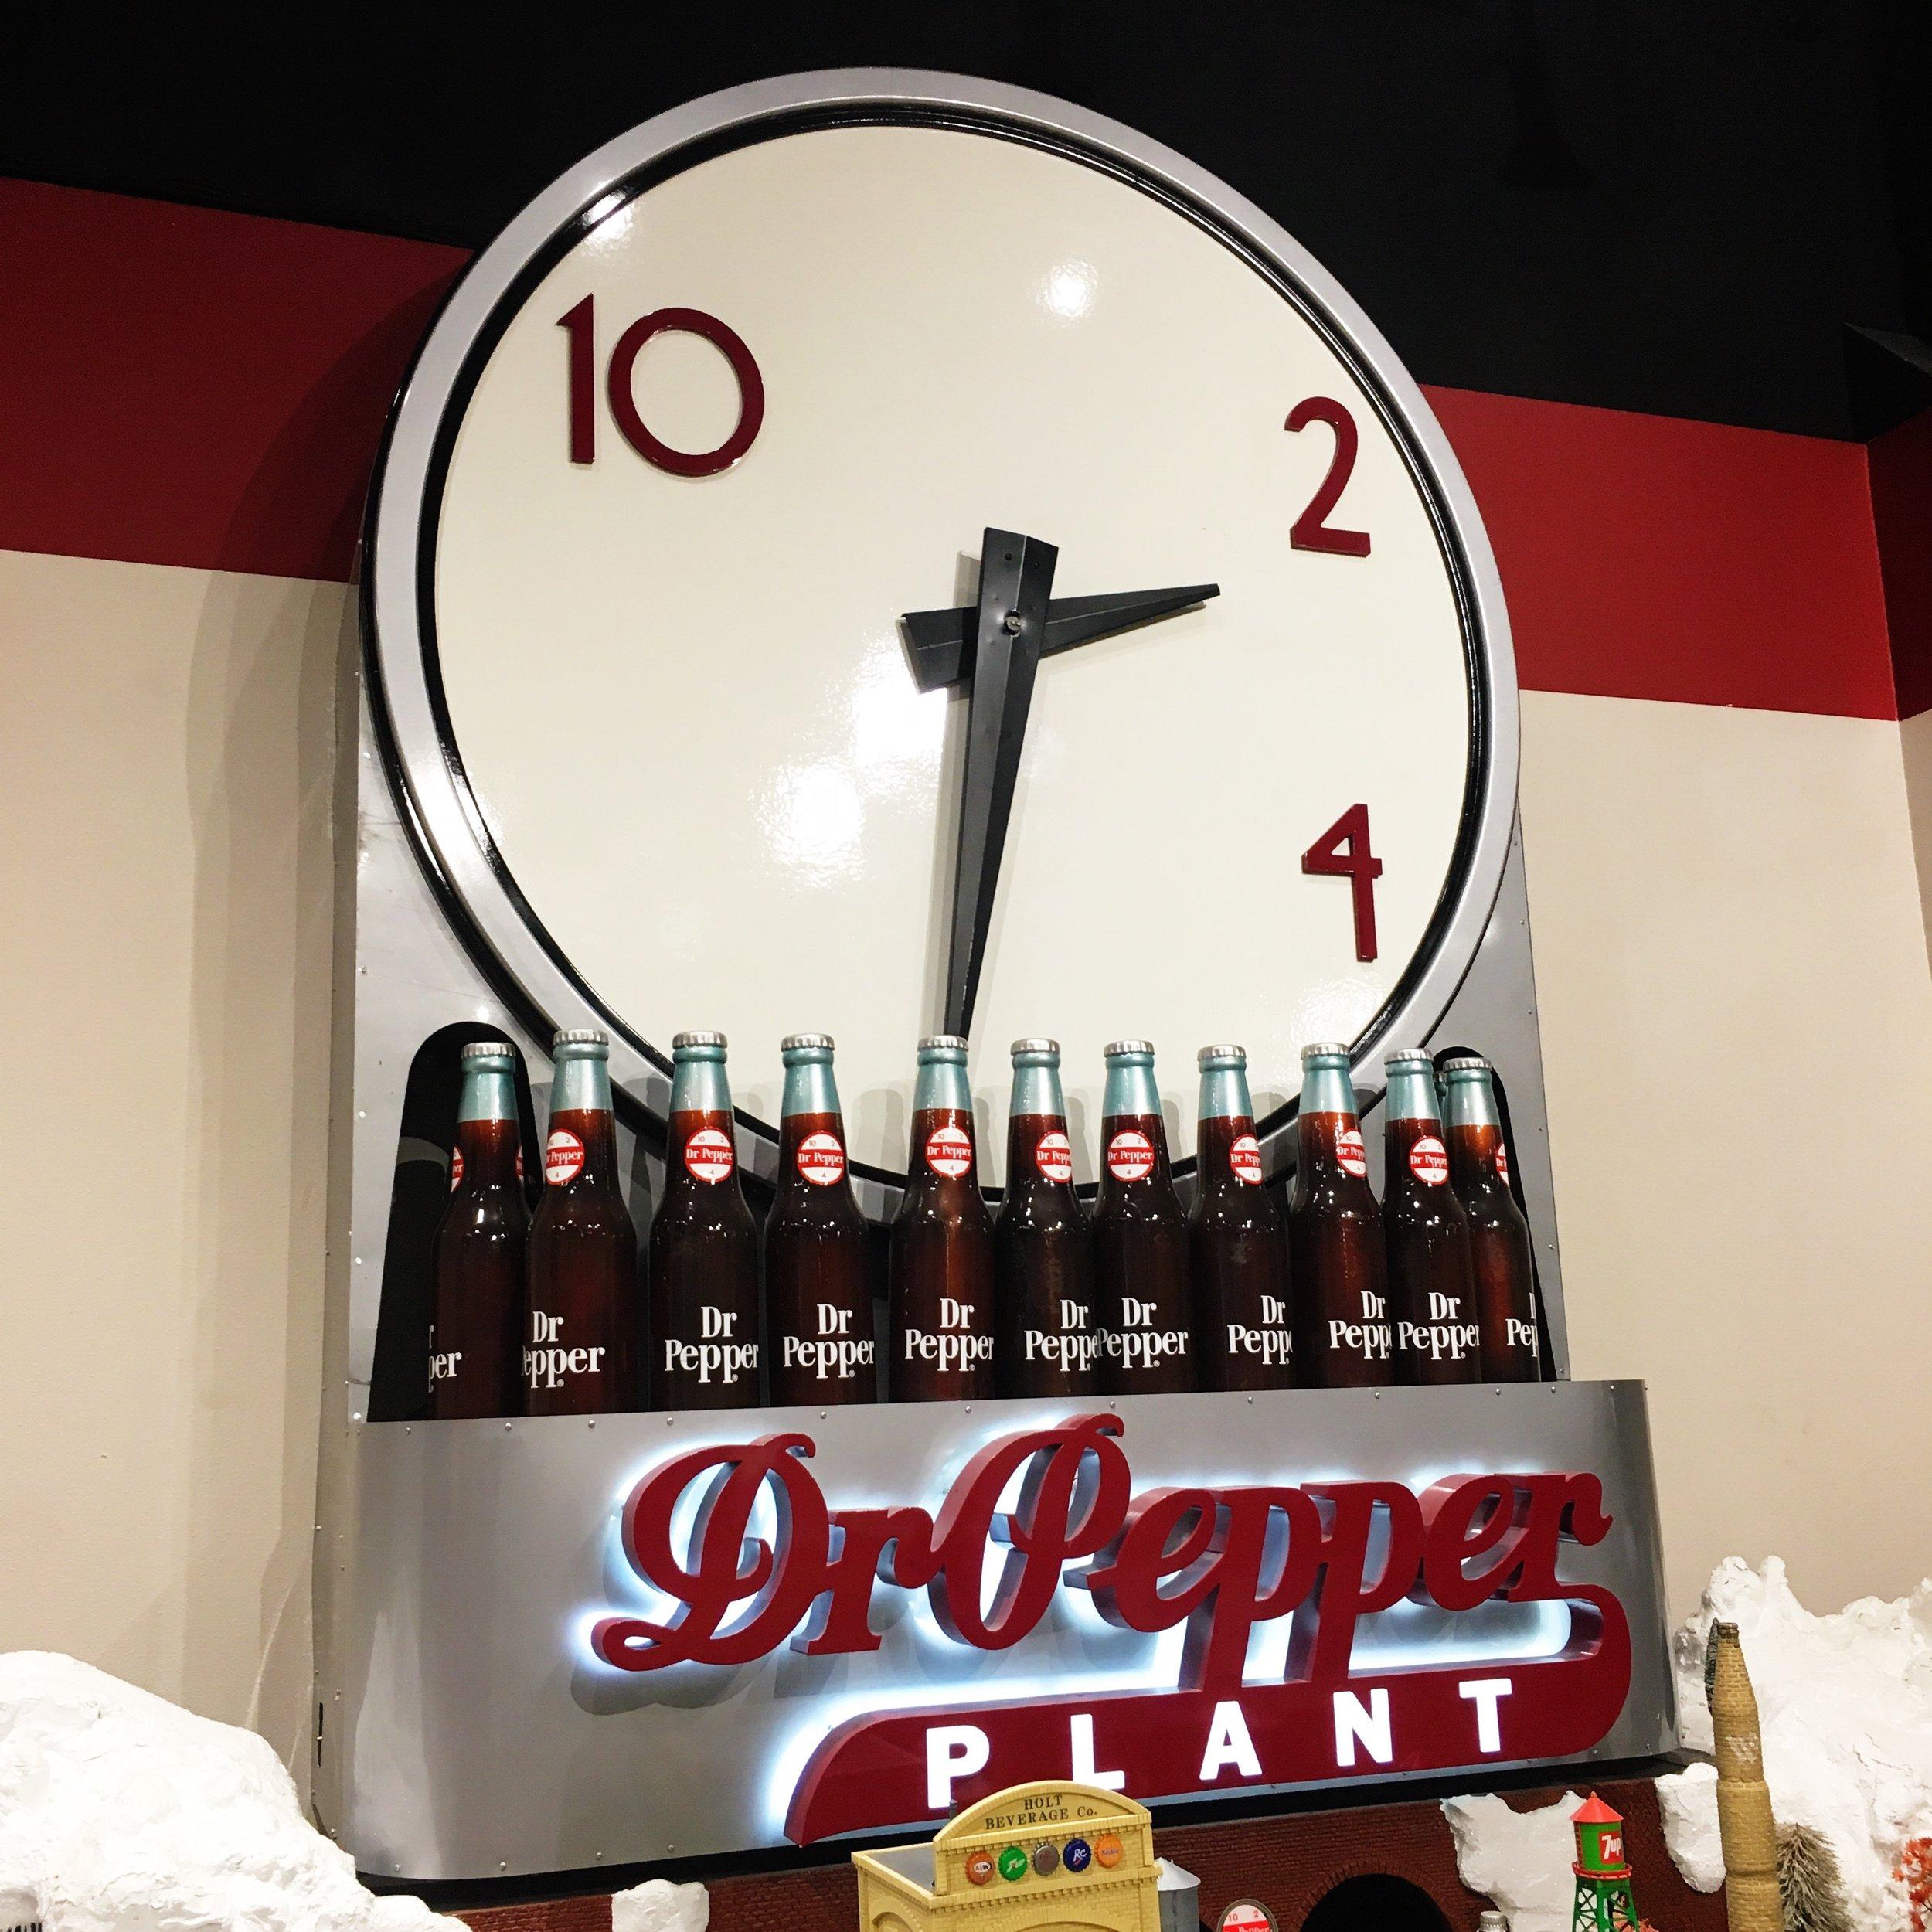 Dr Pepper Musuem - Things to do in Waco, Texas - Wander Dust Blog  (4).JPG